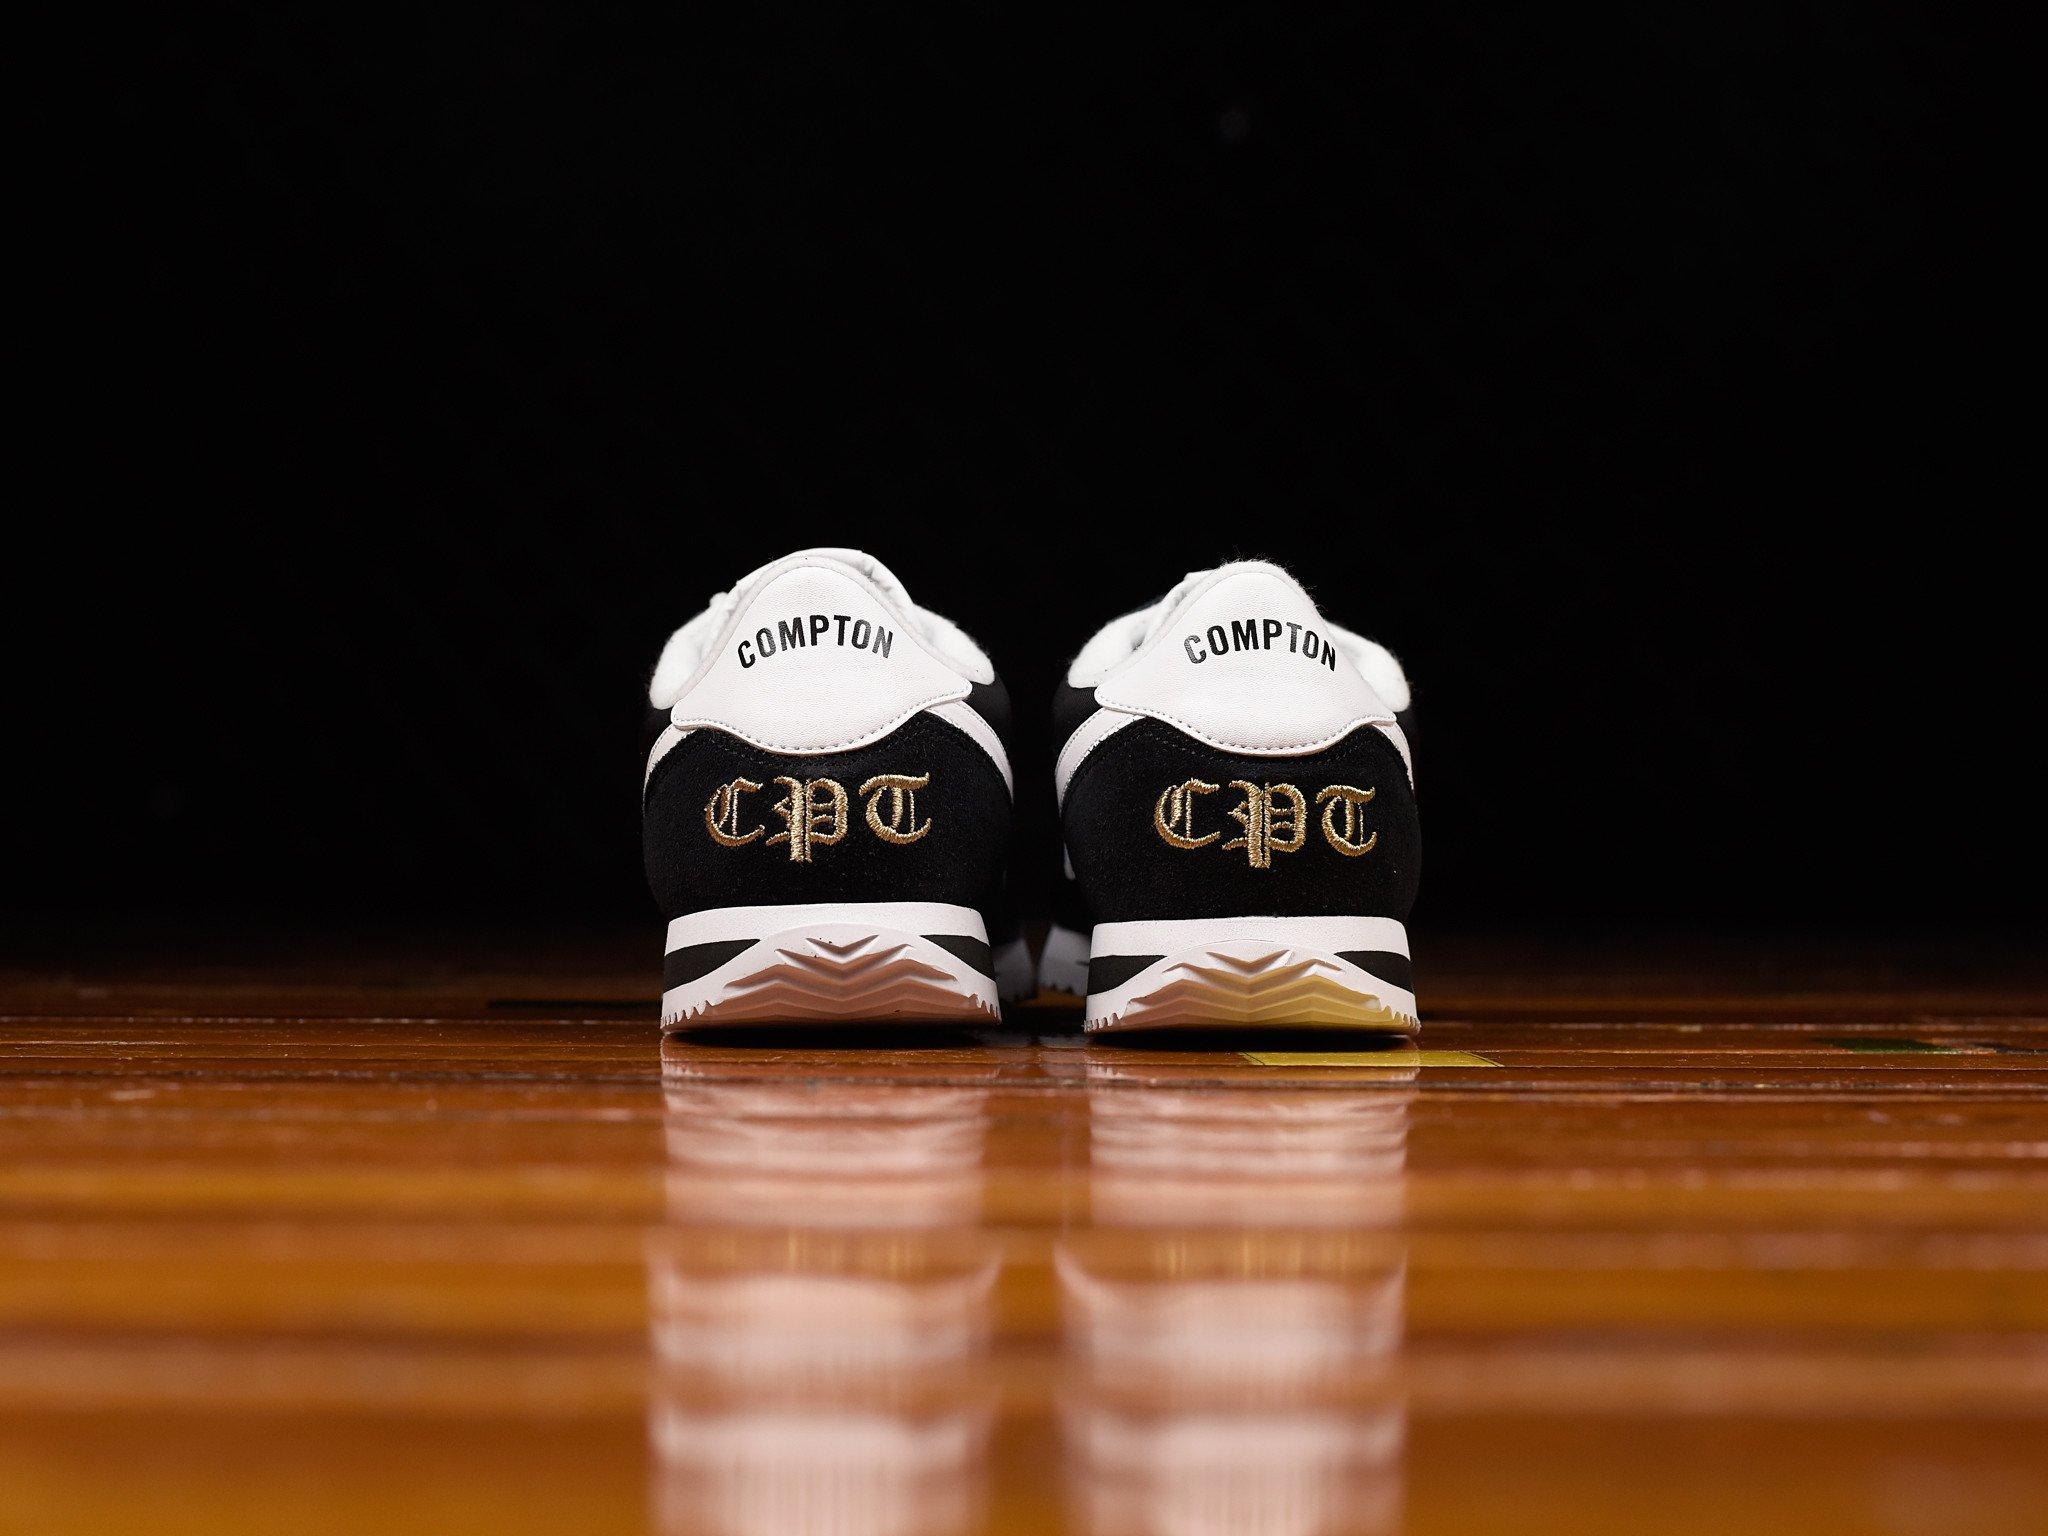 new concept 52772 0a03c Nike Cortez Compton Long Beach Release Info | SneakerNews.com